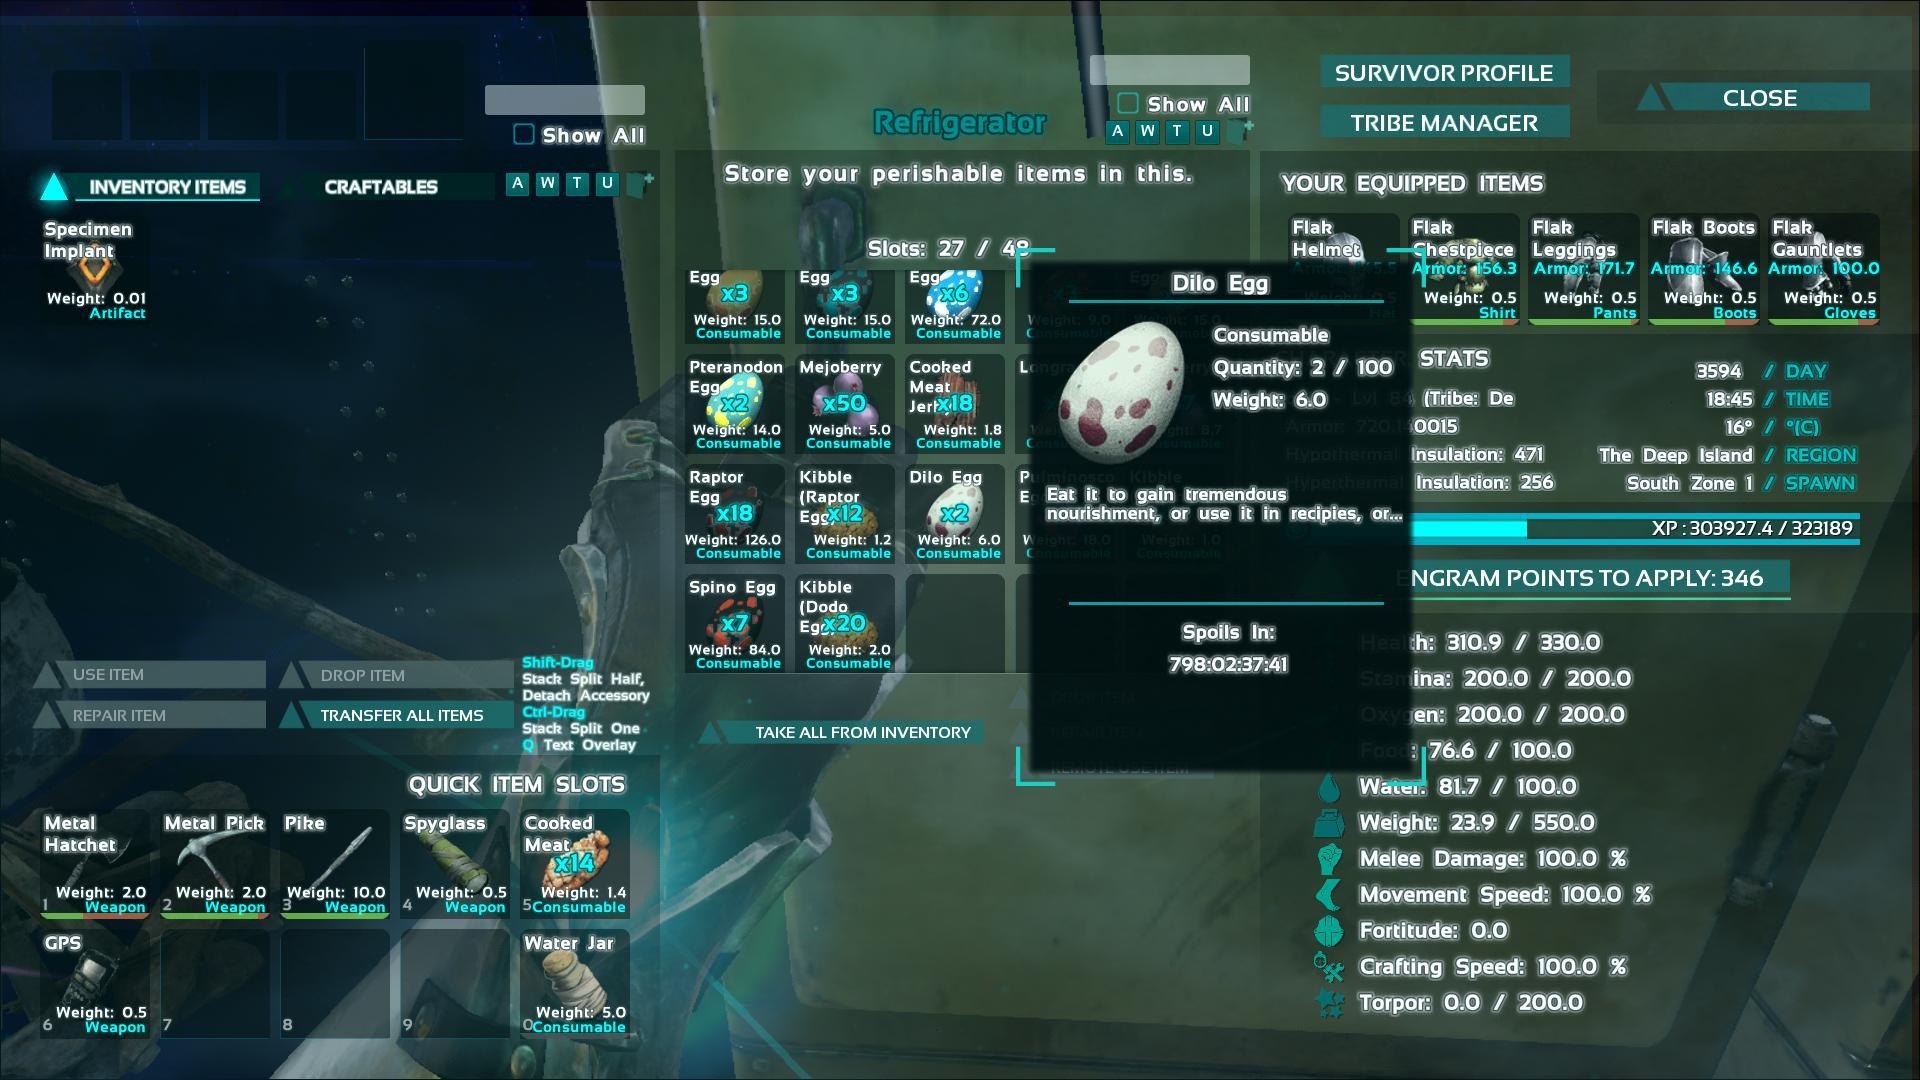 Dilo Egg ark screenshot - Gamingcfg com